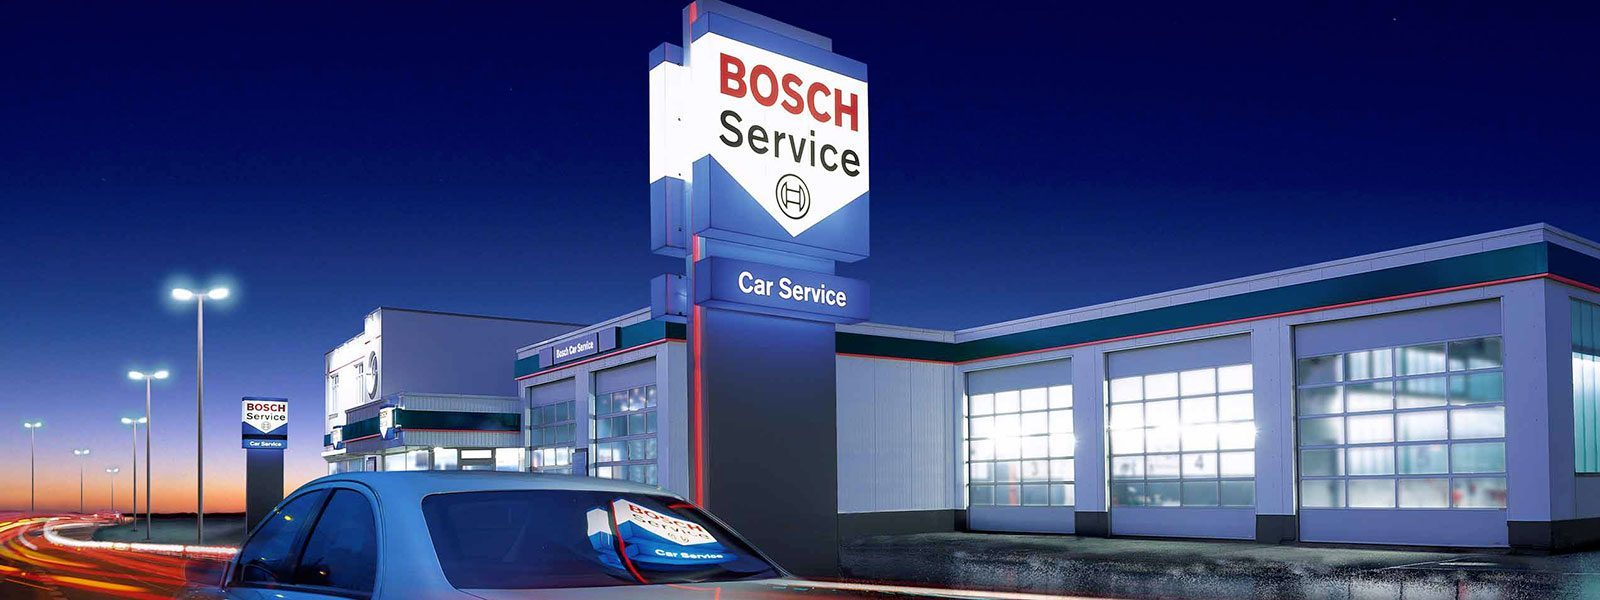 bosh-service